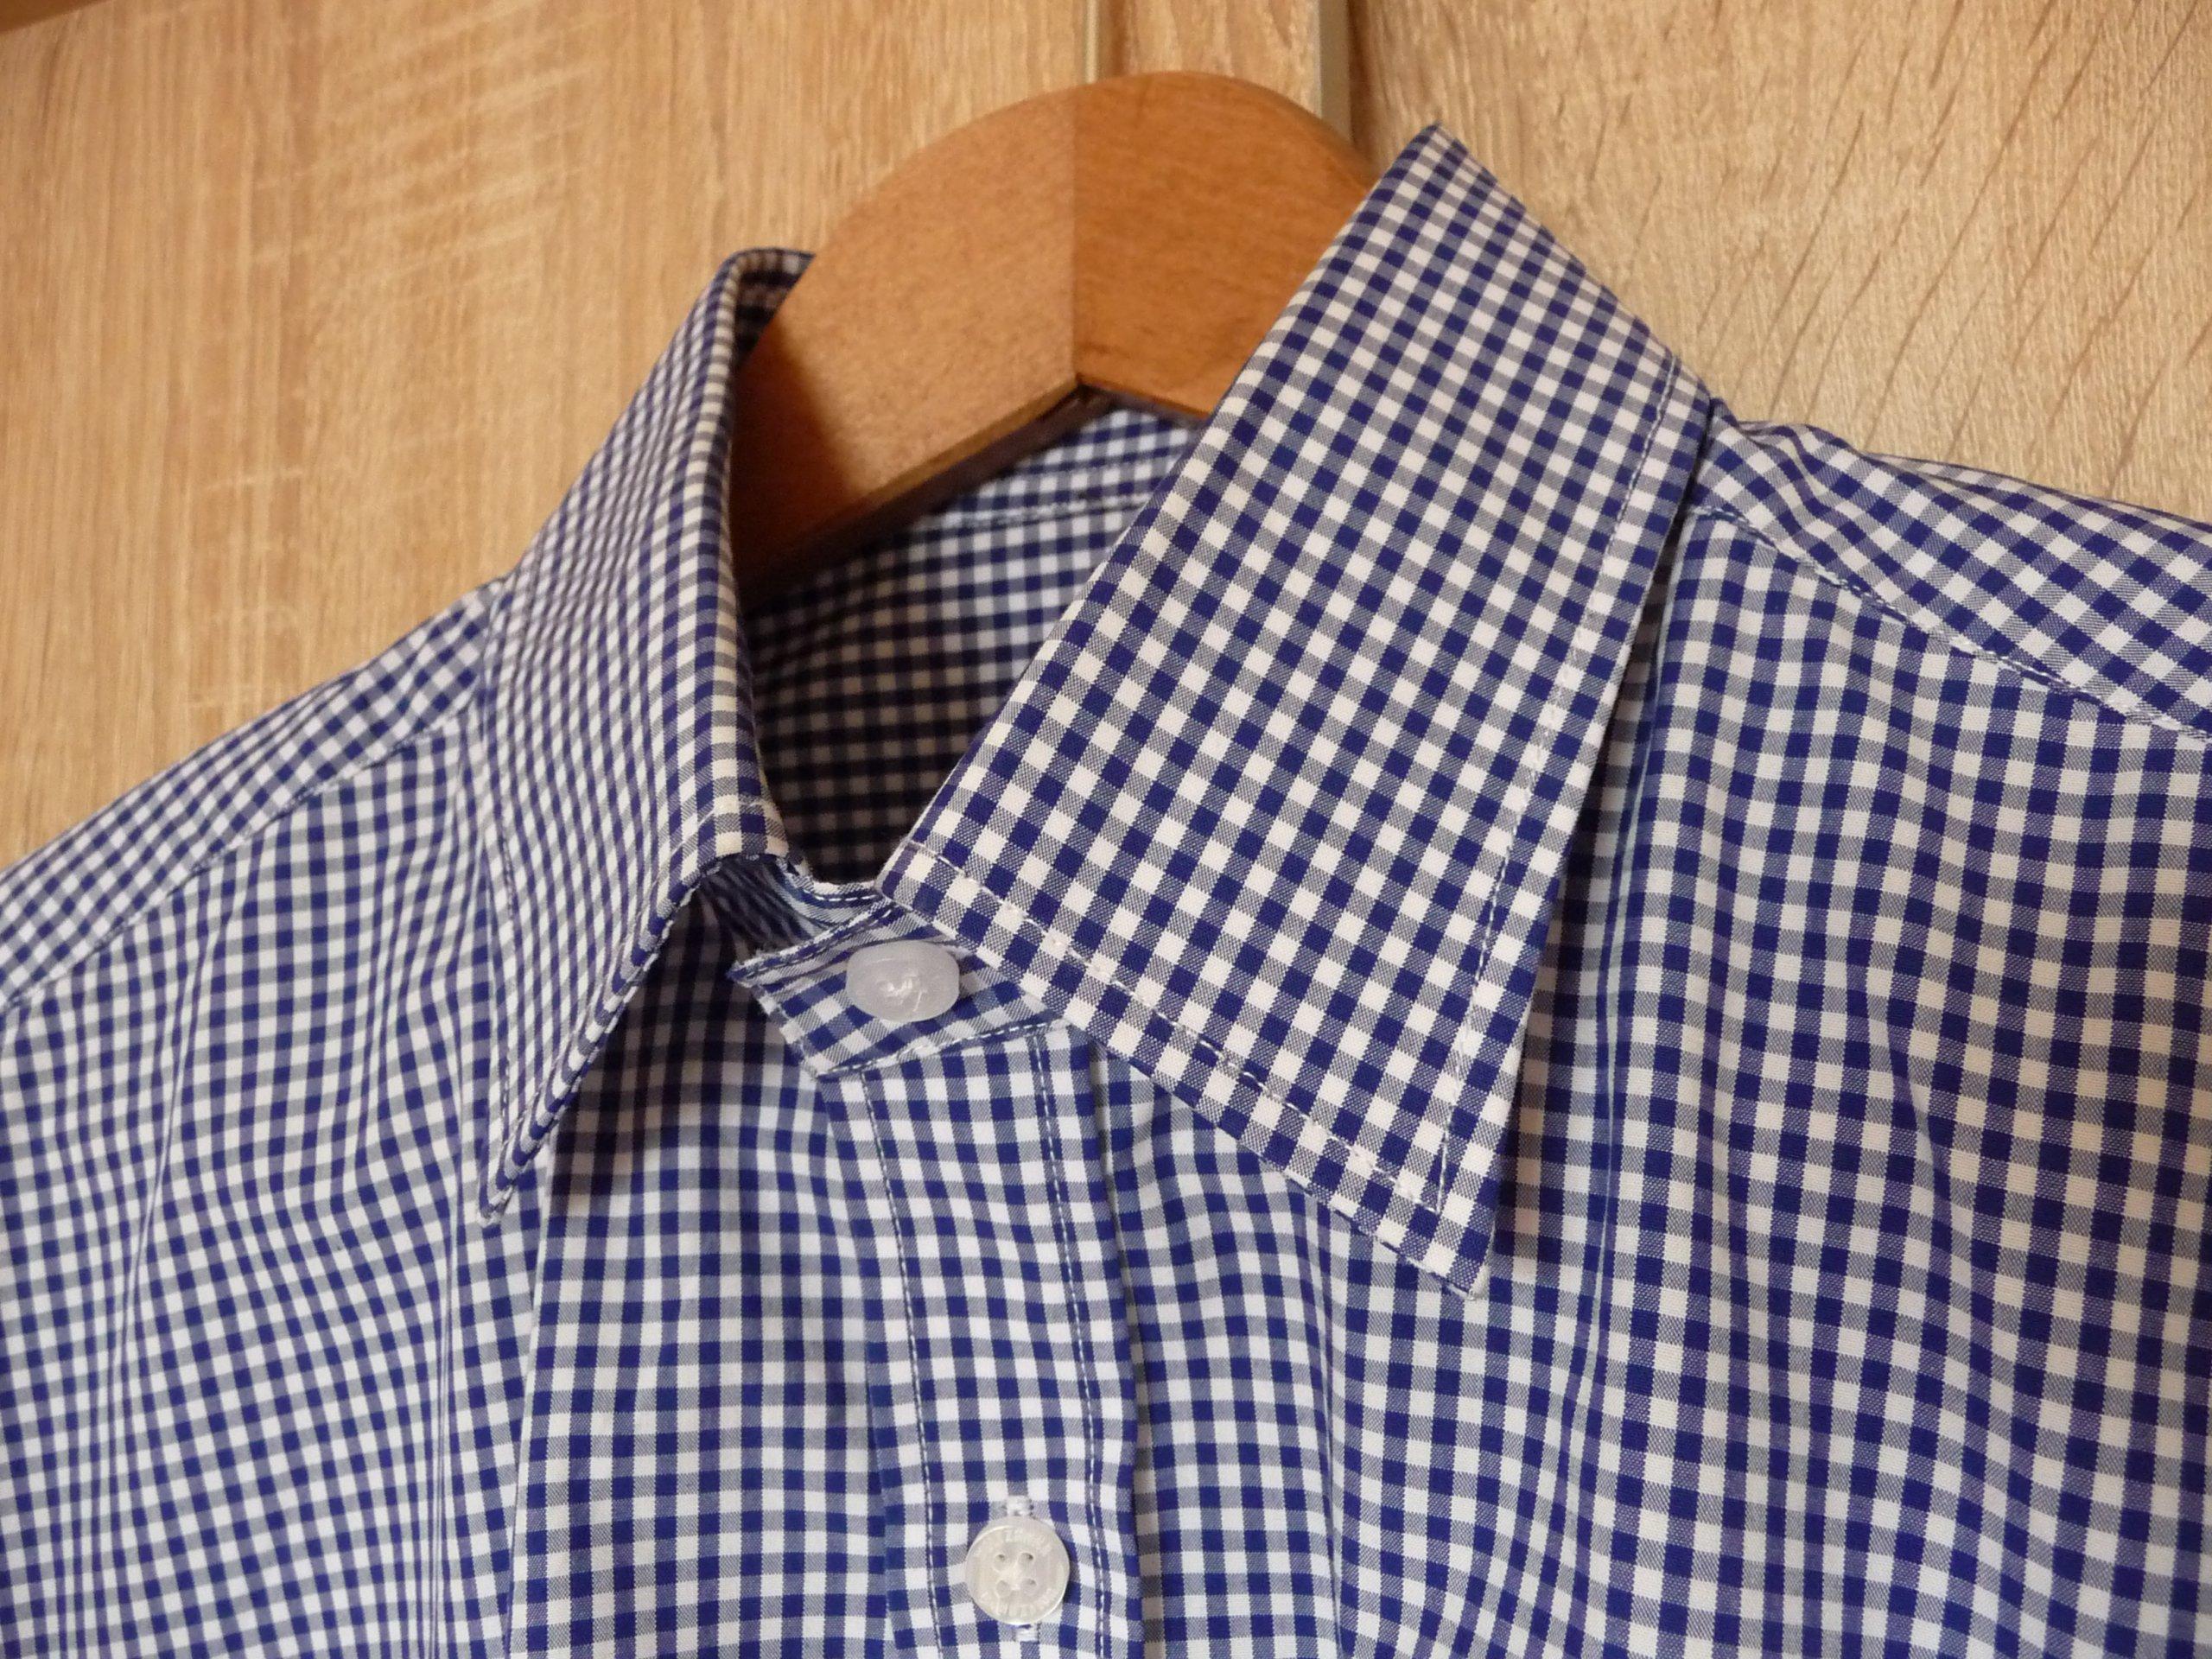 Elegancka koszula męska WÓLCZANKA rozm. 39 SLIM